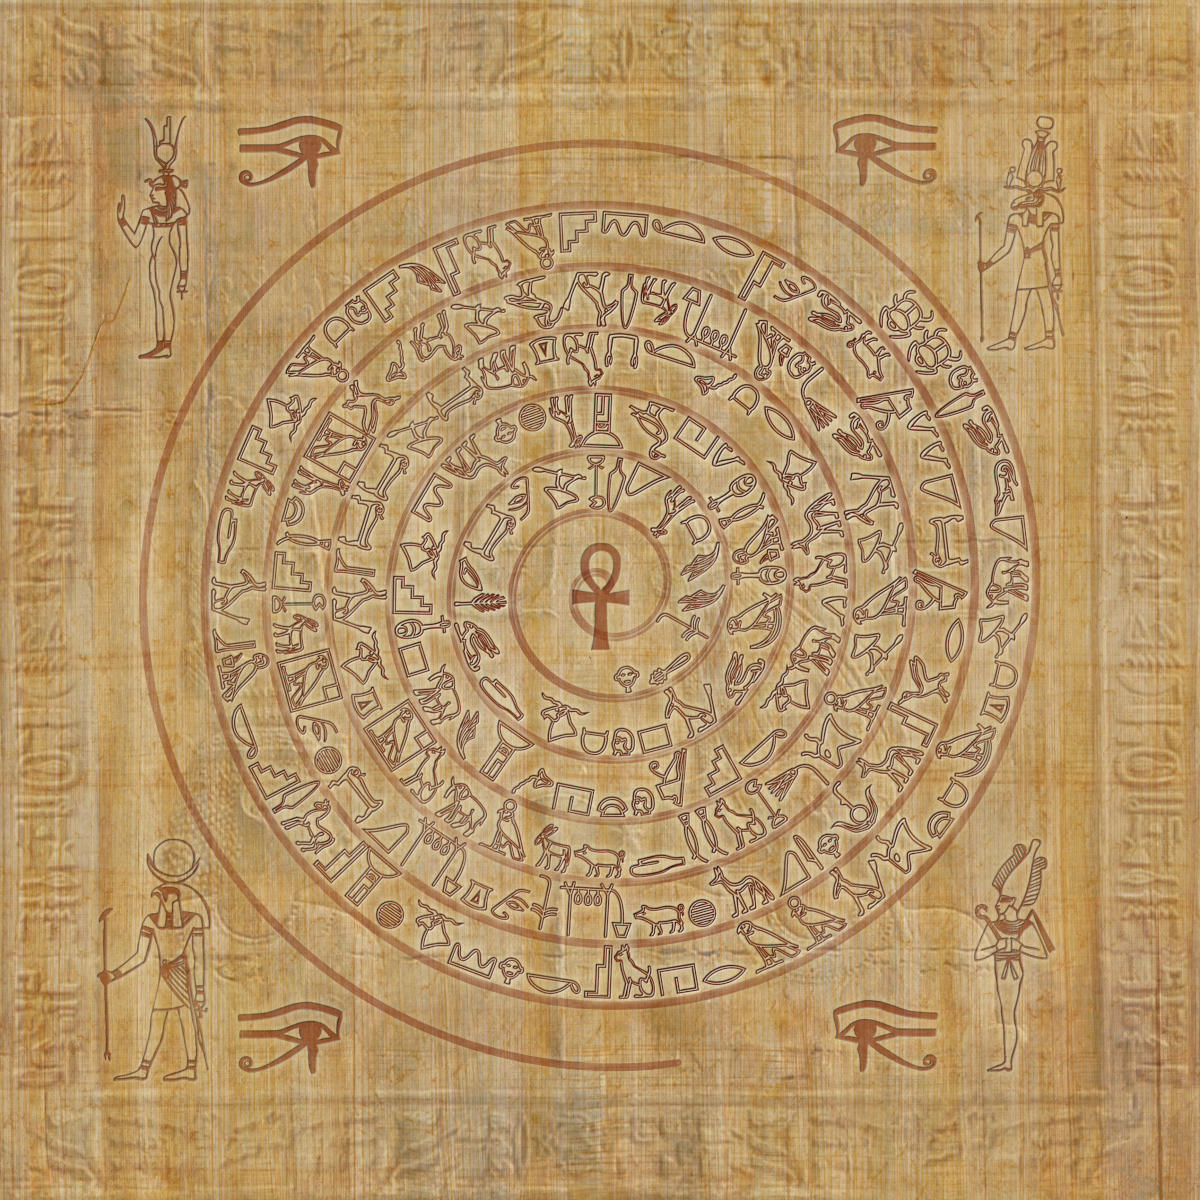 Cosmic spiral of Egyptian hieroglyphs